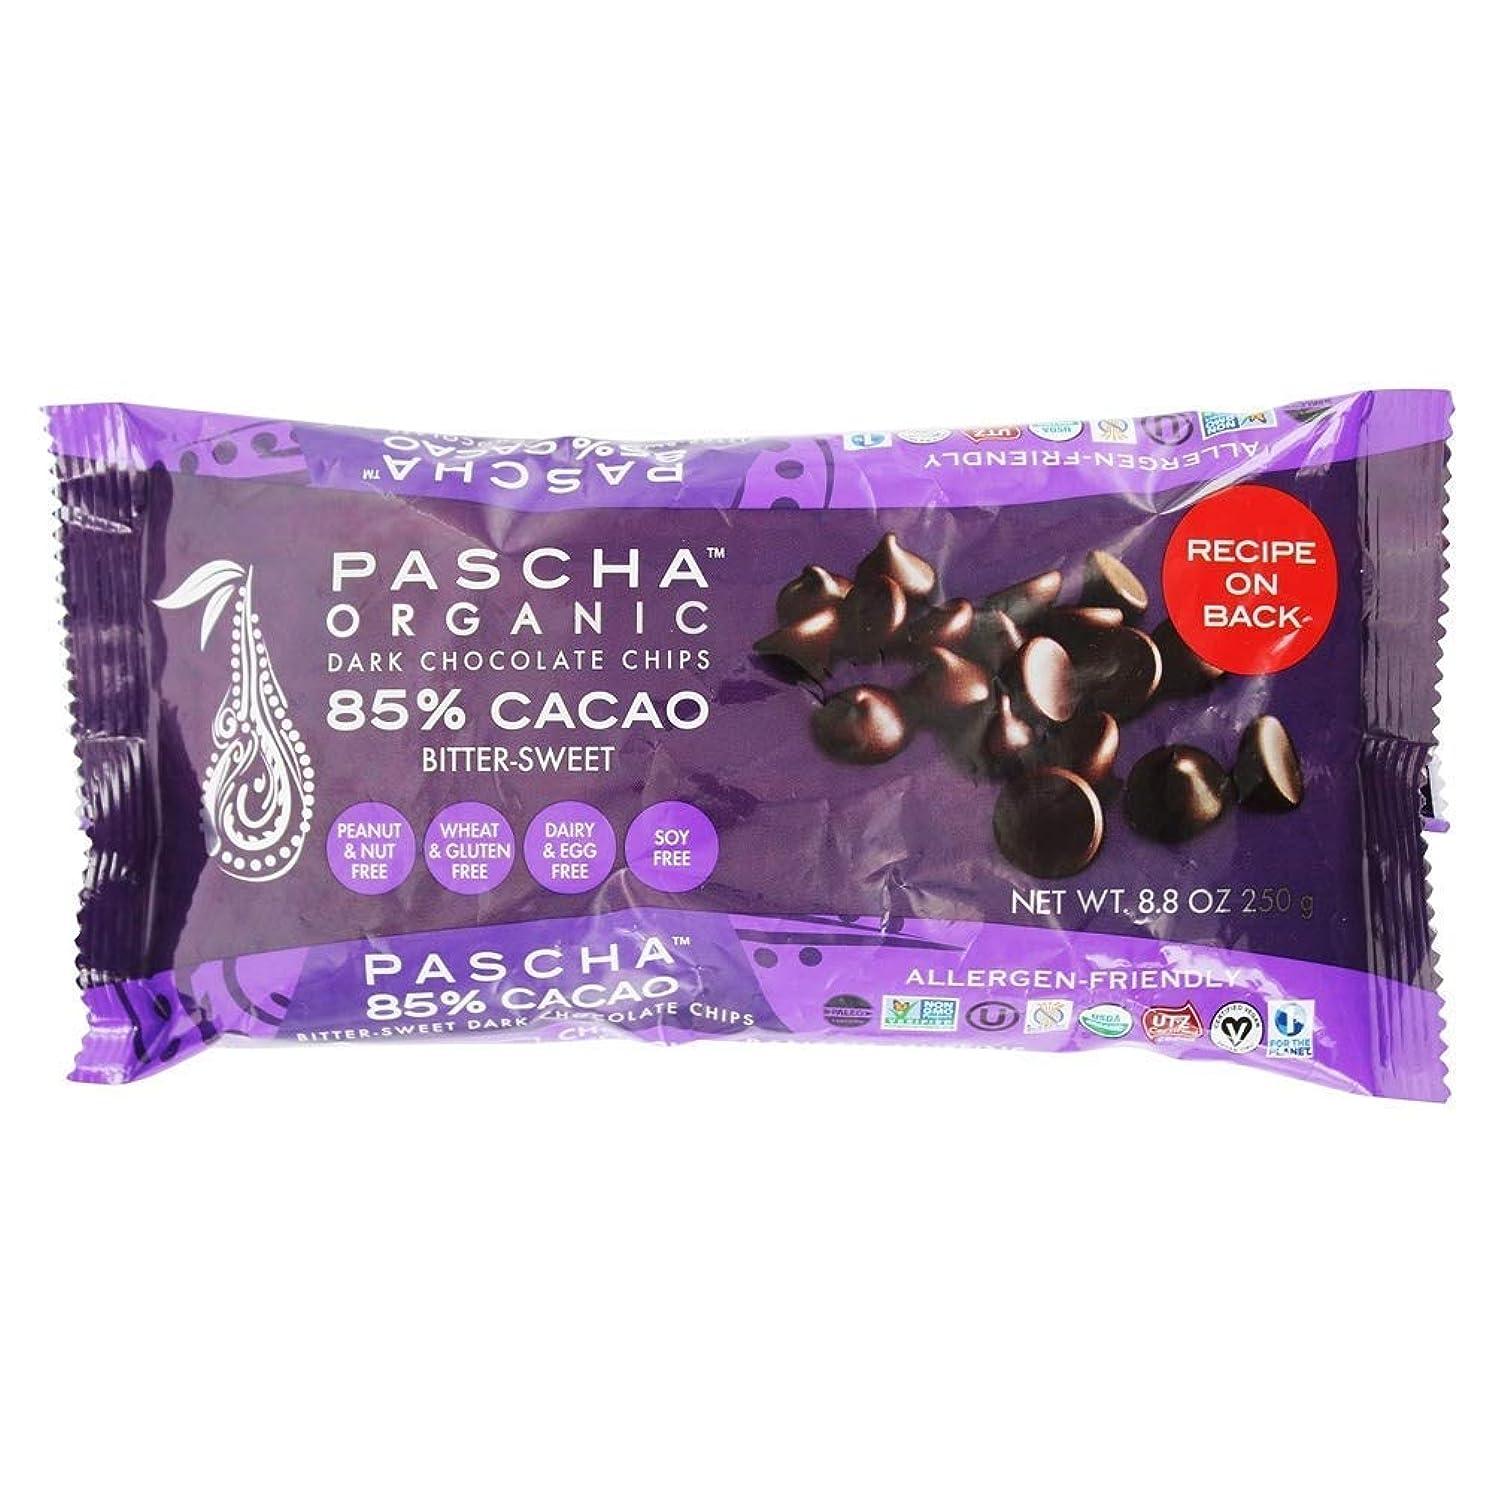 Pascha Chocolate Baking Chip, 85% Caca, 8.8 oz